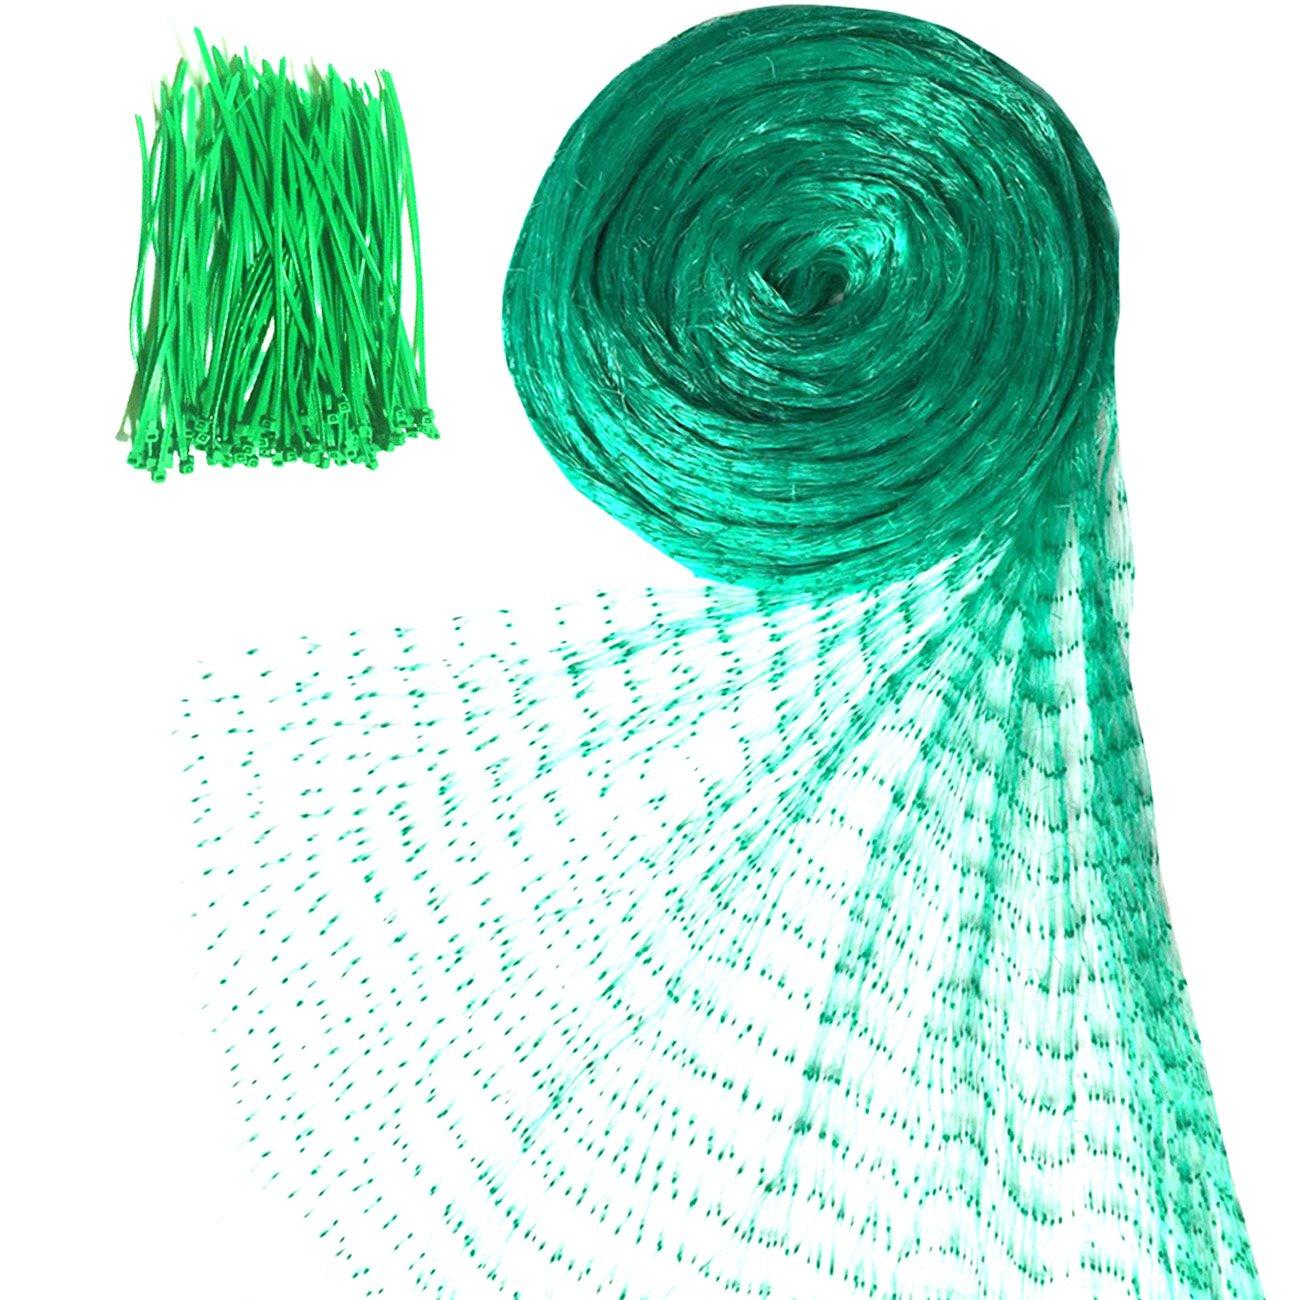 Senneny Bird Netting, 33Ft x 13Ft Anti-Bird Netting 100 Pcs Nylon Cable Ties, Green Garden Netting Protecting Plants Fruit Trees from Rodents Birds Deer